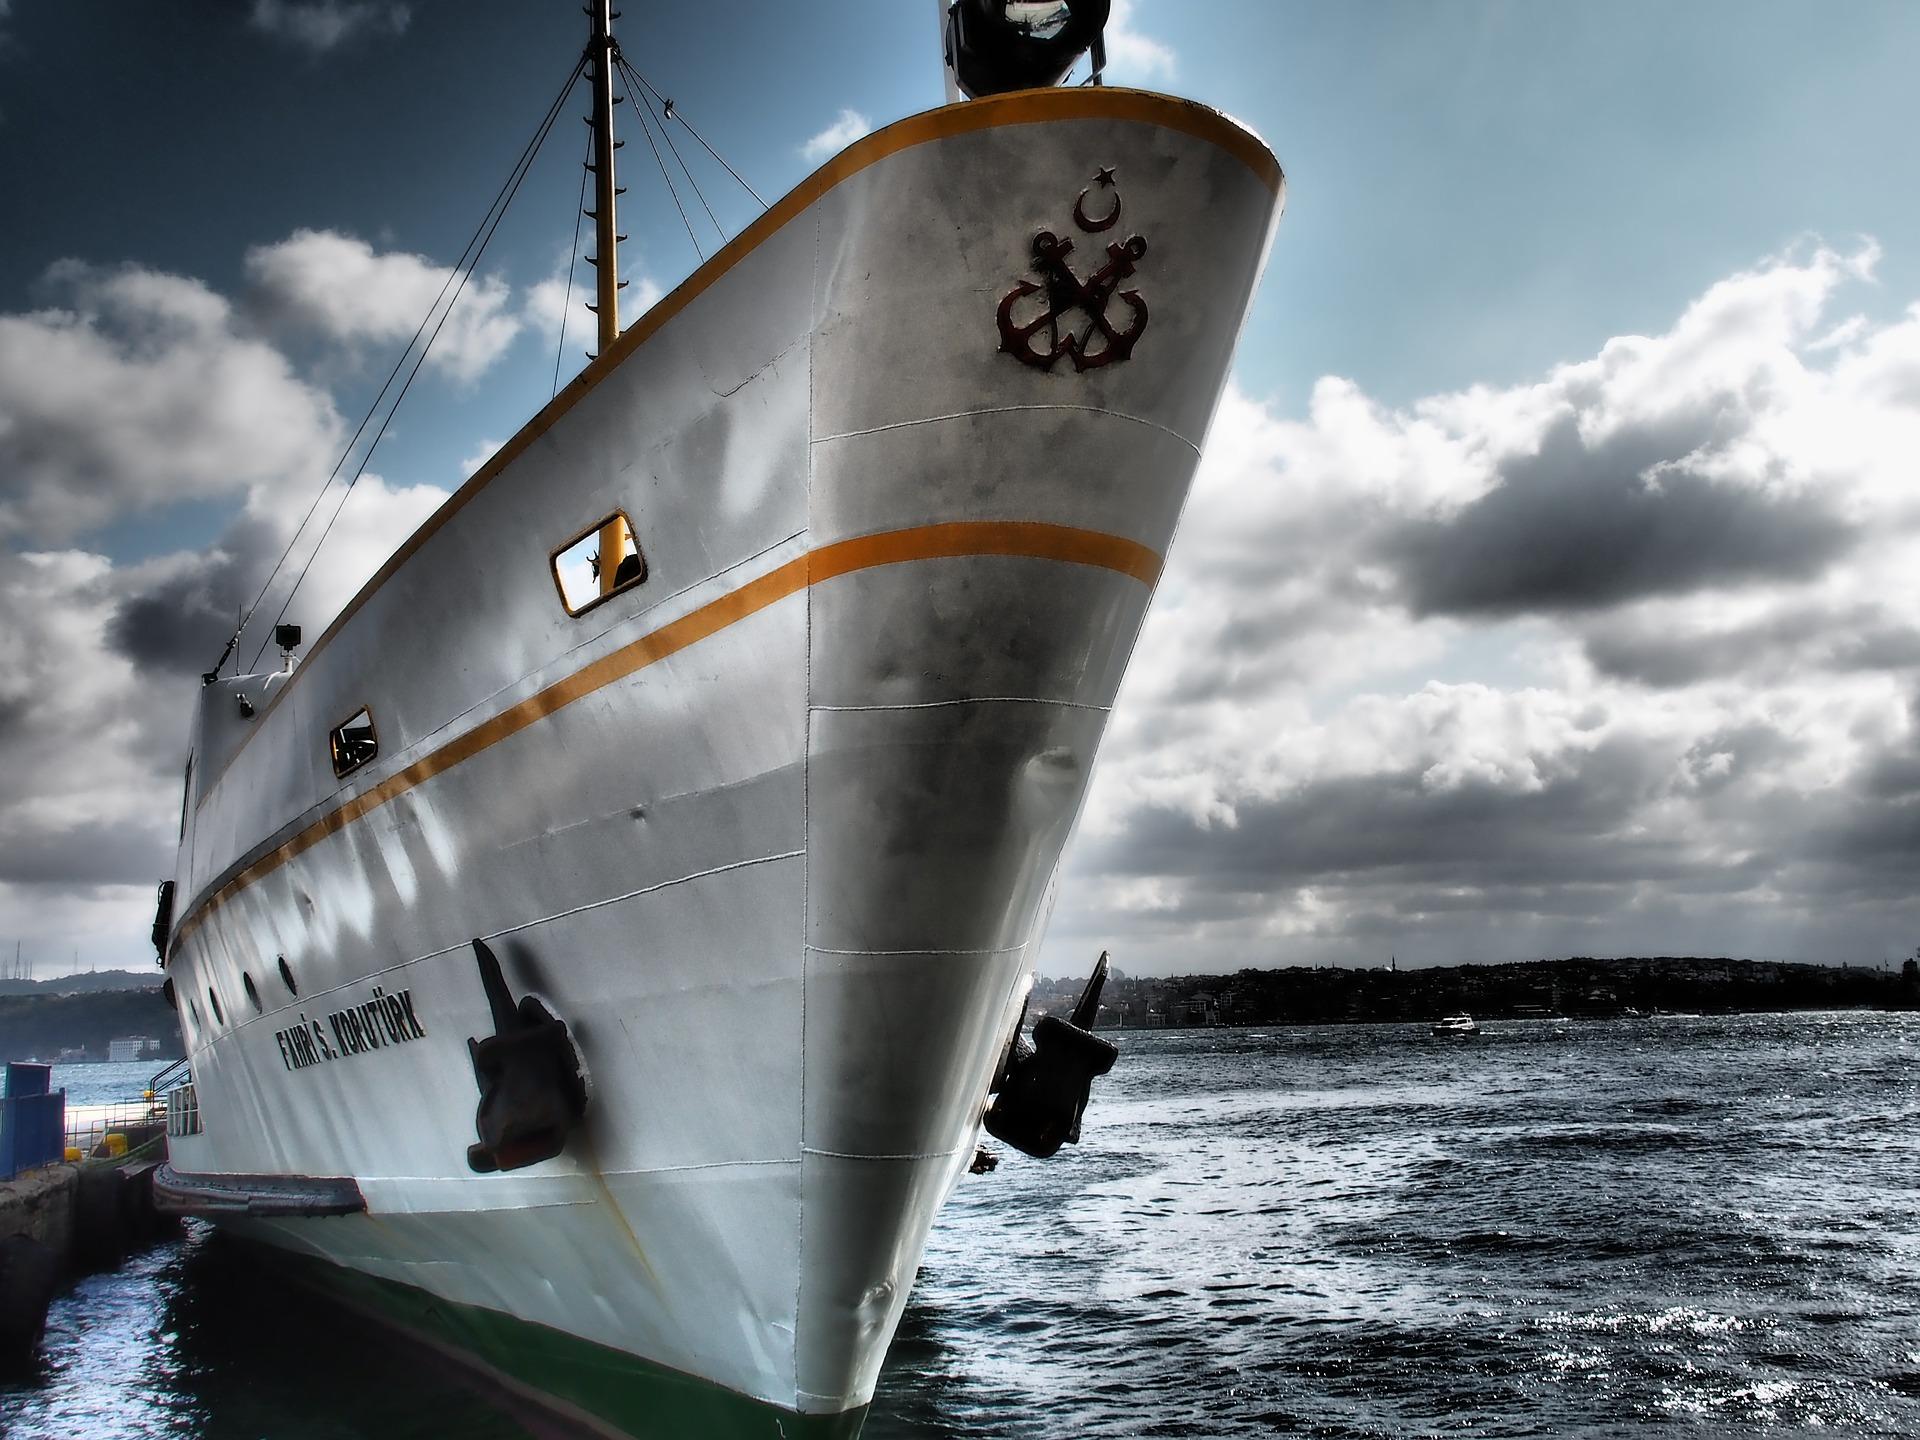 bateau, navire, Ferry, Mer, ancre, Sky, nuages - Fonds d'écran HD - Professor-falken.com